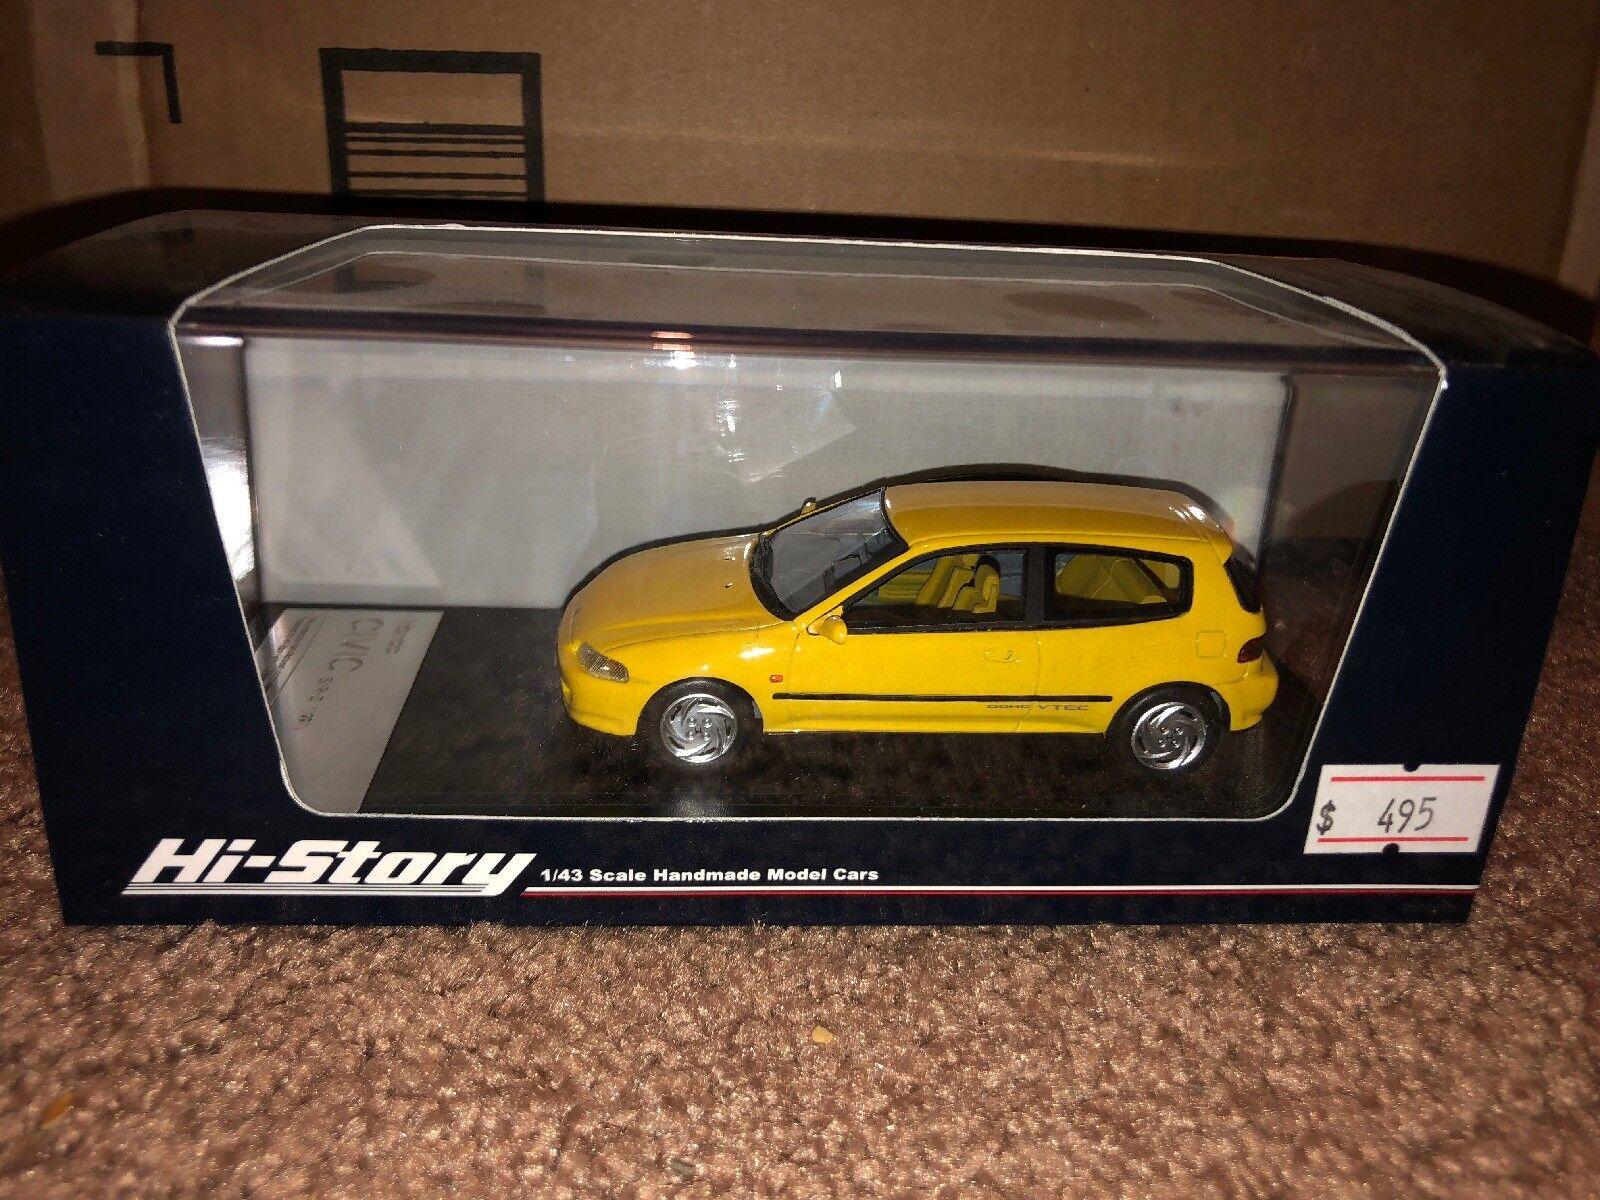 Hi-story 1 43 Honda Civic Yellow Resin EG SiR